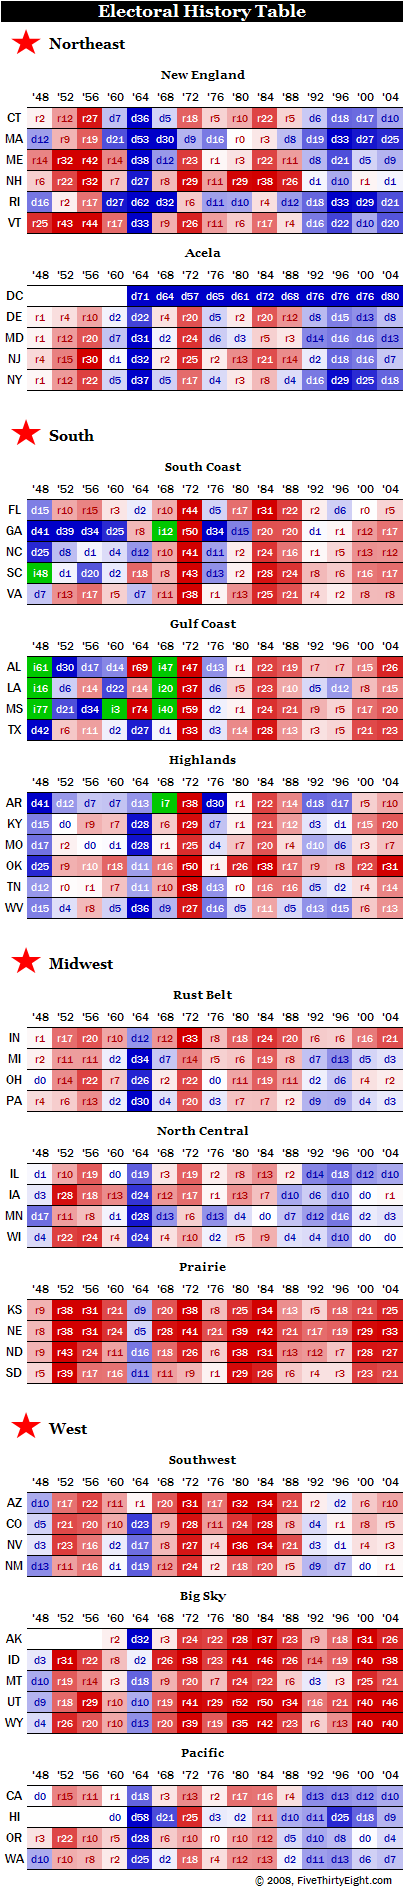 Electoral History Charts | FiveThirtyEight